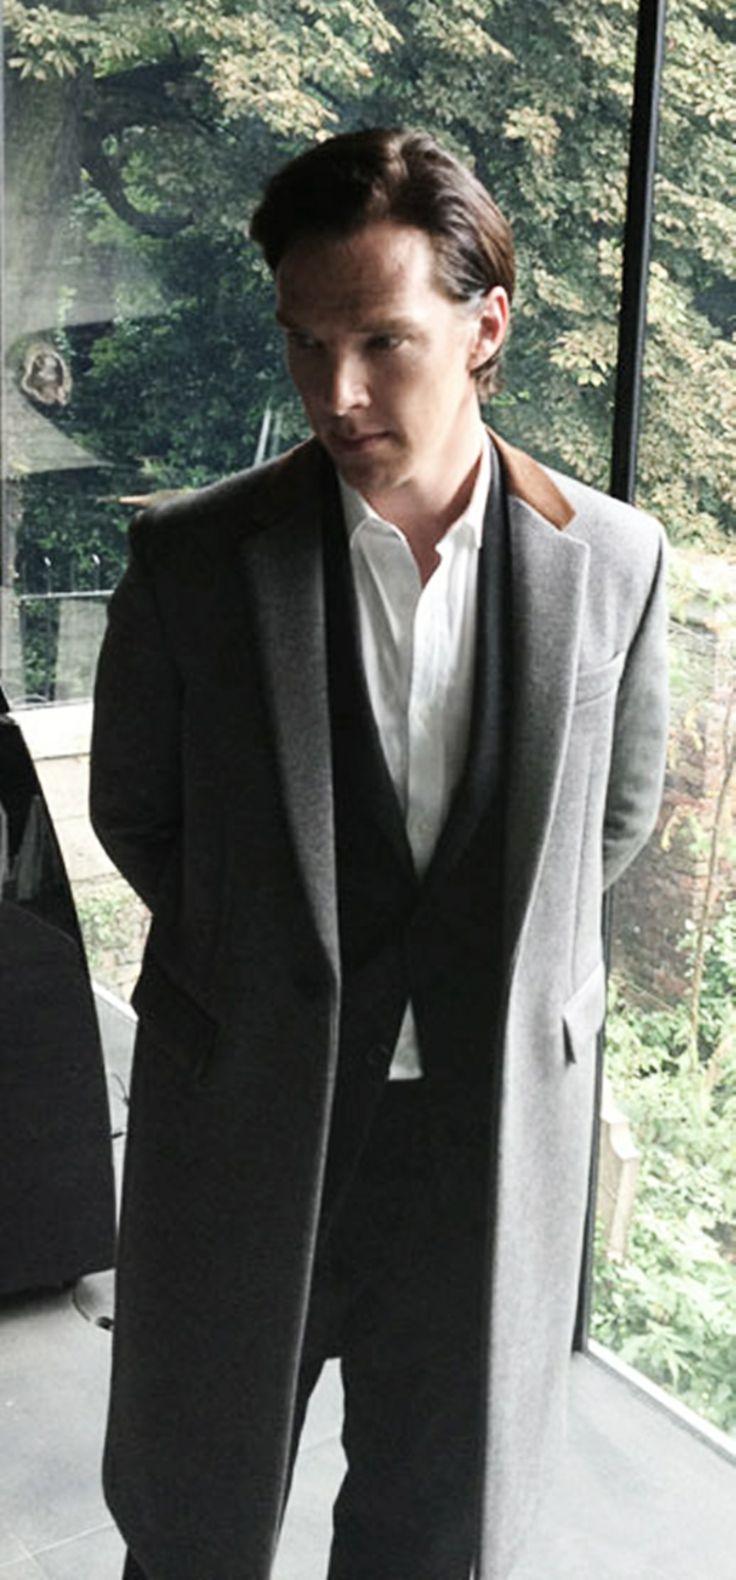 Benedict Cumberbatch. That jacket is amazing.